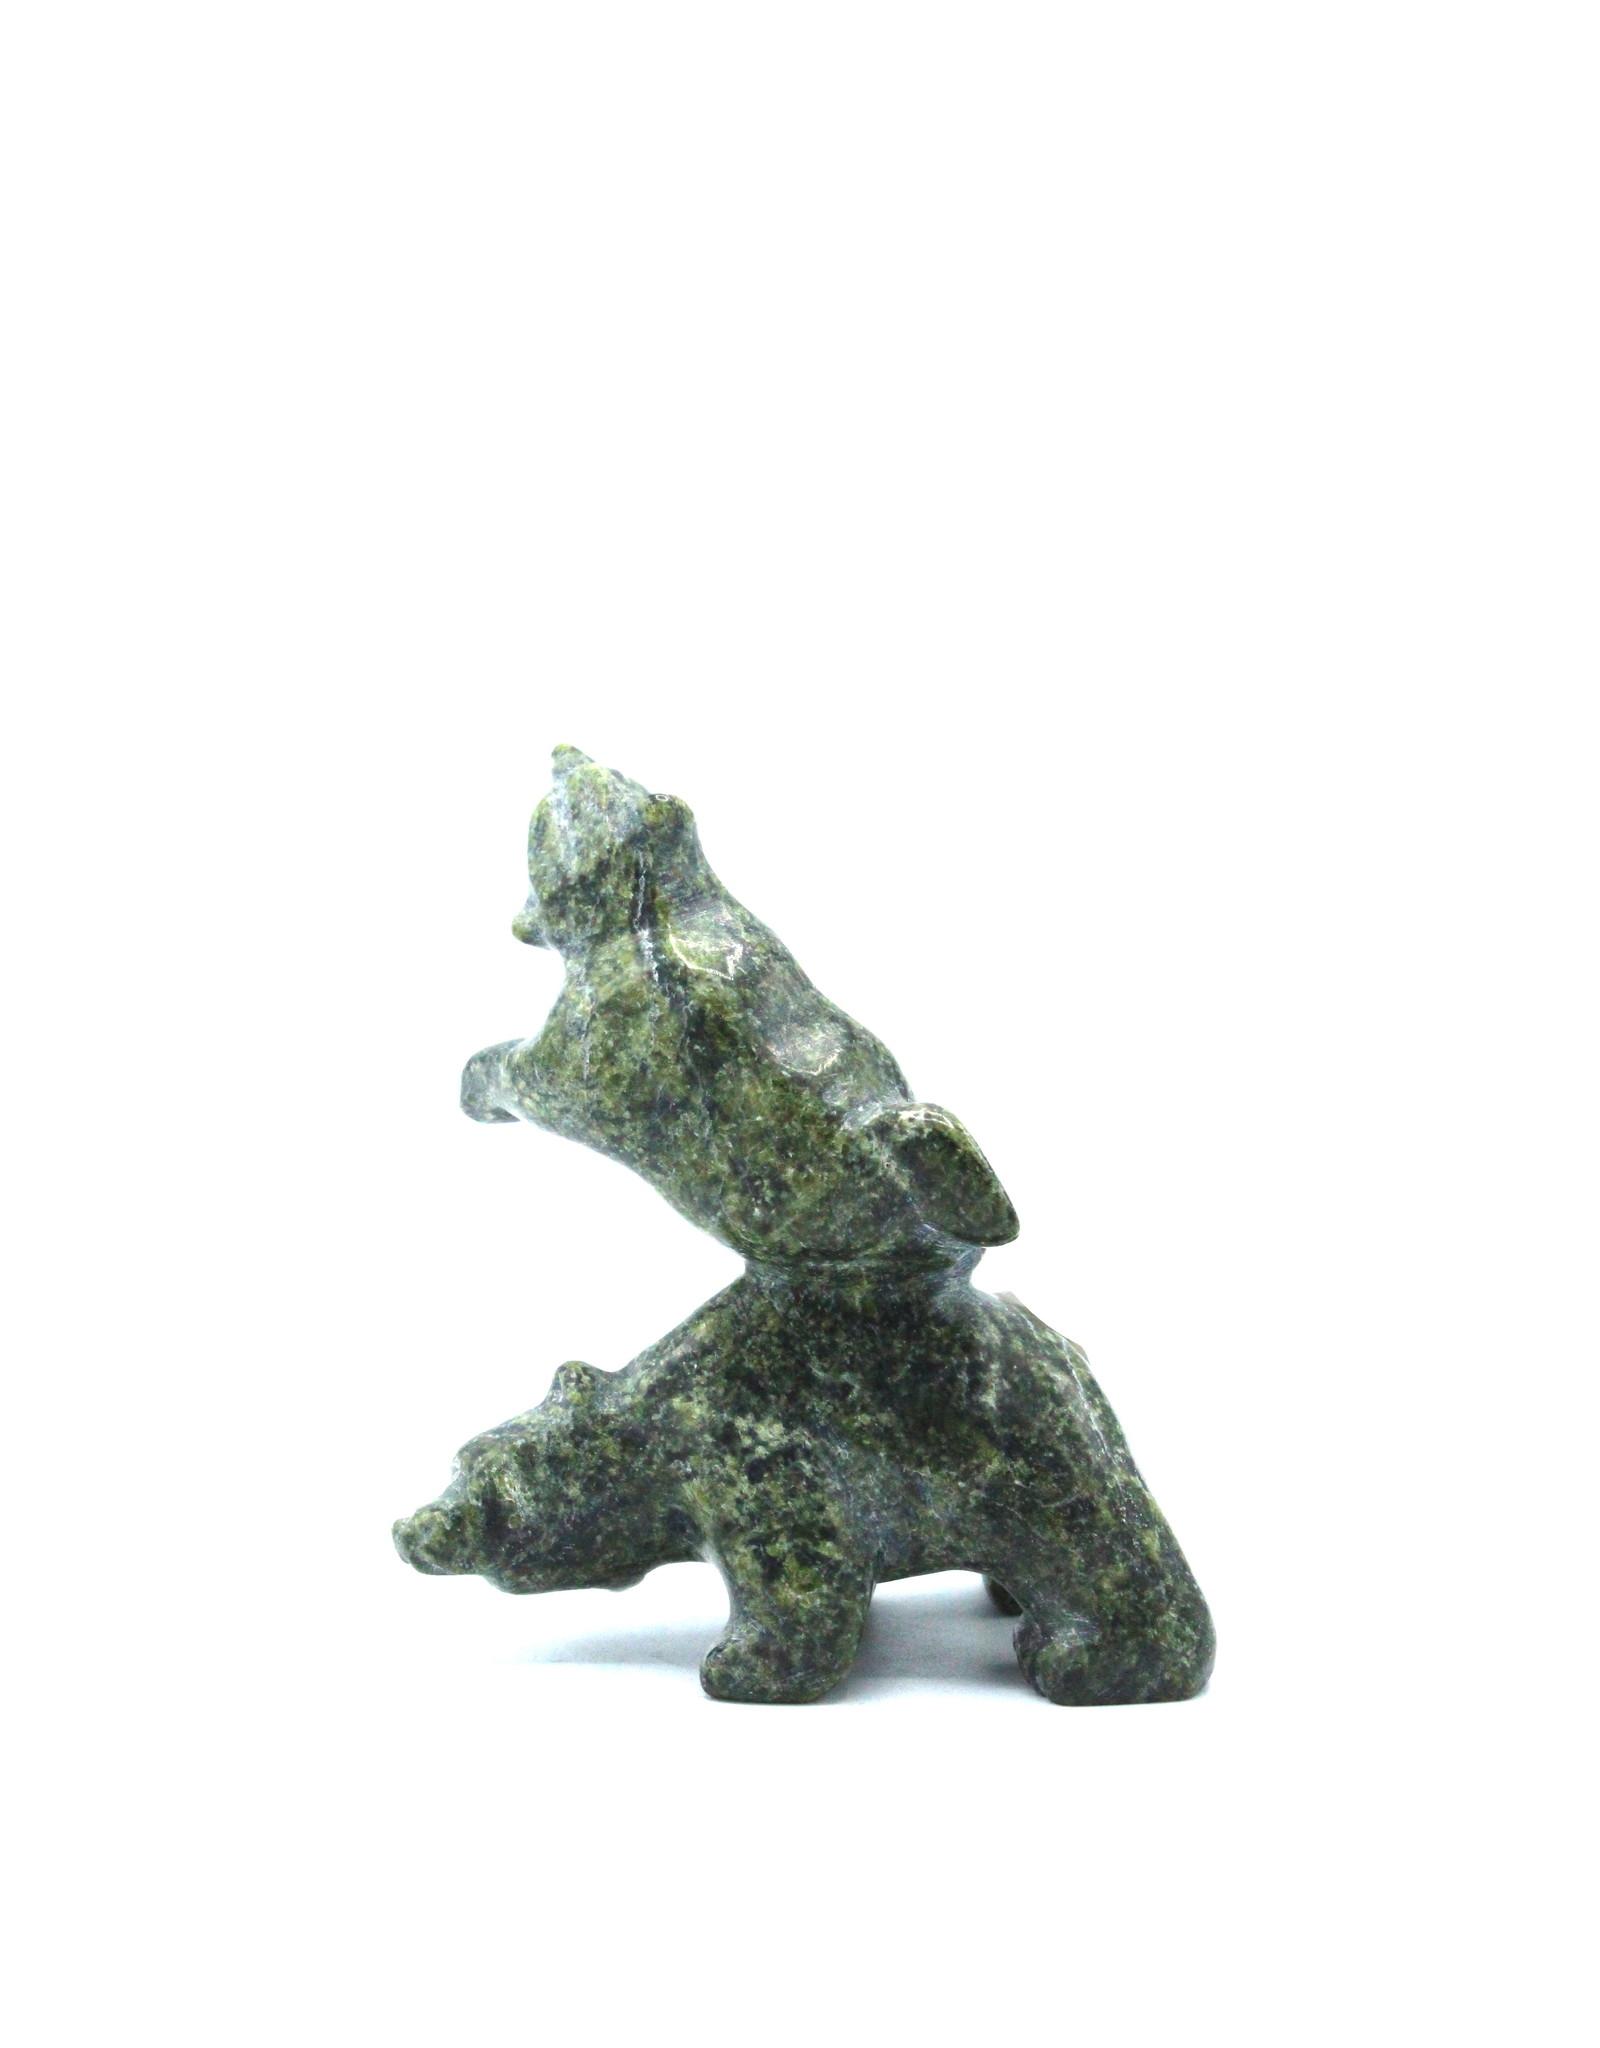 6856N 2 Bears by Johnny Papigatook